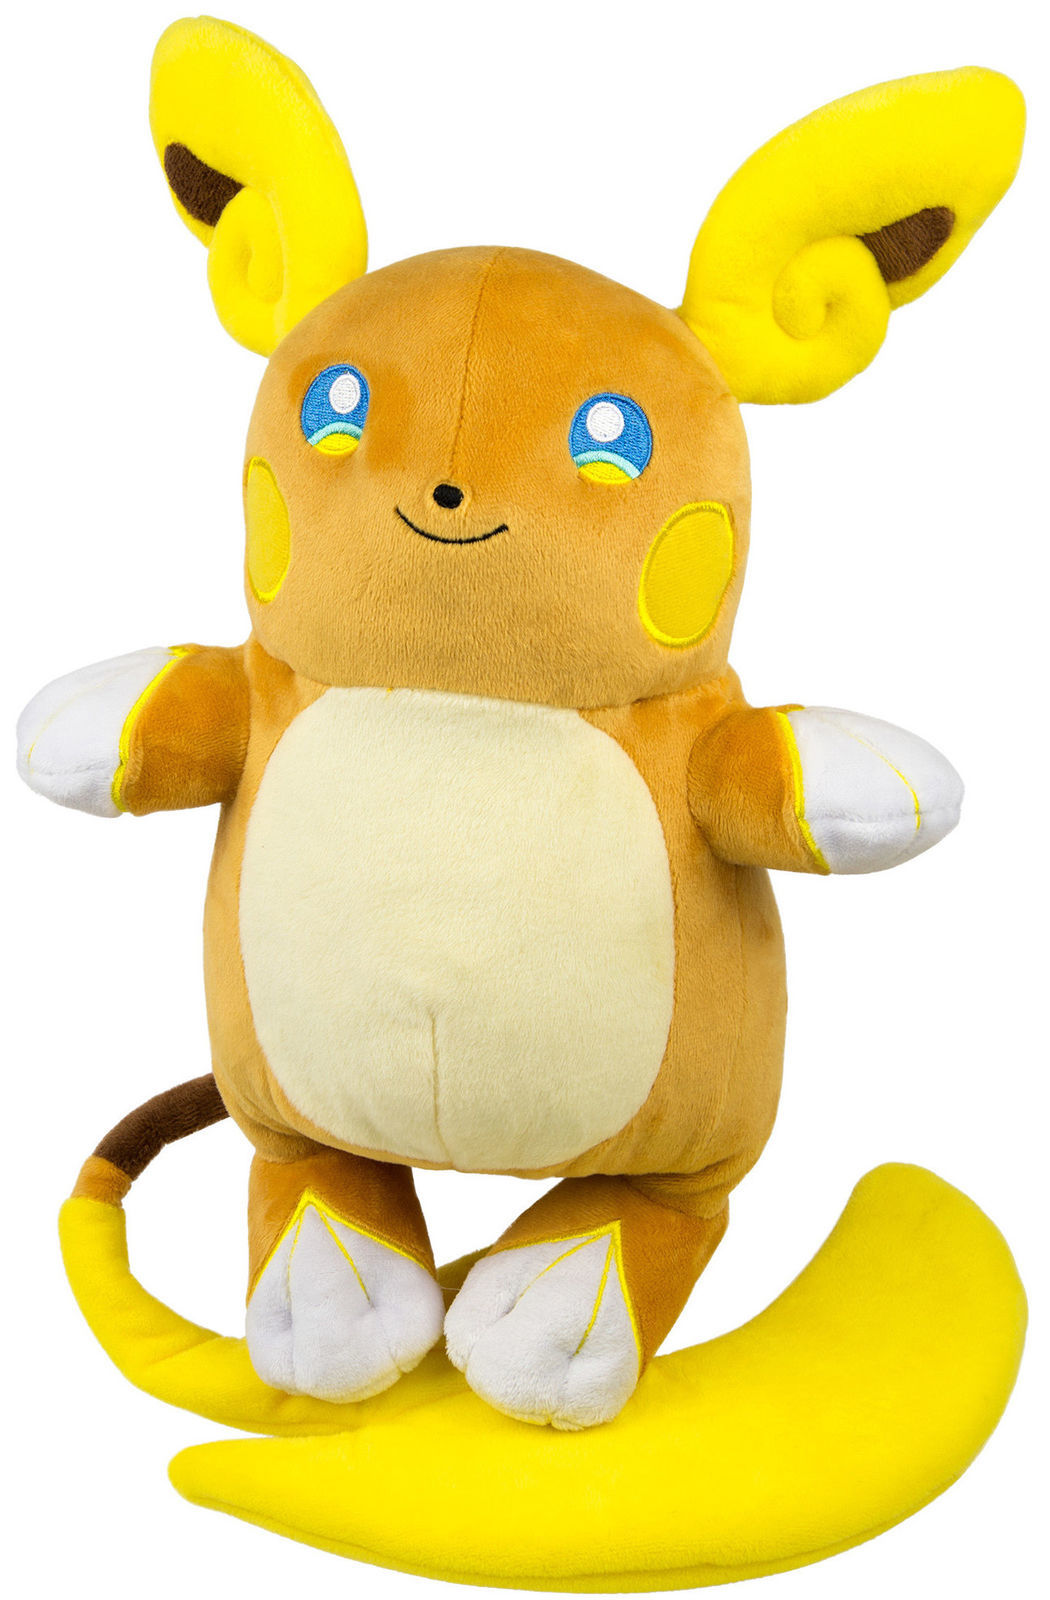 "Pokemon Large Plush Alolan Raichu 10"" image"